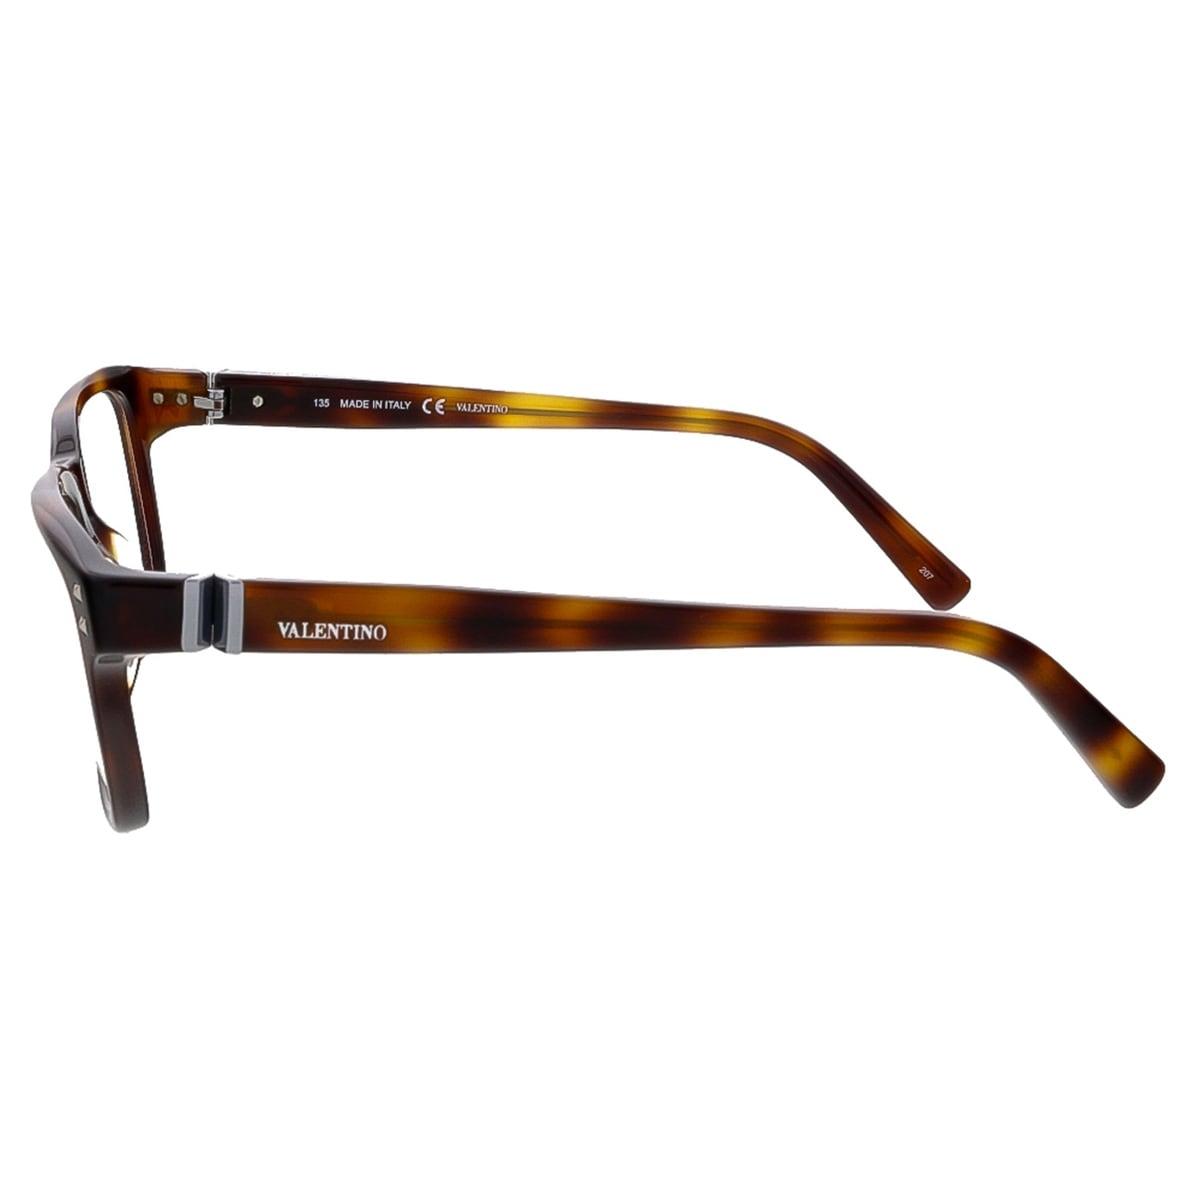 03d2b37200 Shop Valentino V2634 214 Havana Rectangular Valentino Eyewear - 53-18-135 -  Free Shipping Today - Overstock - 13464741